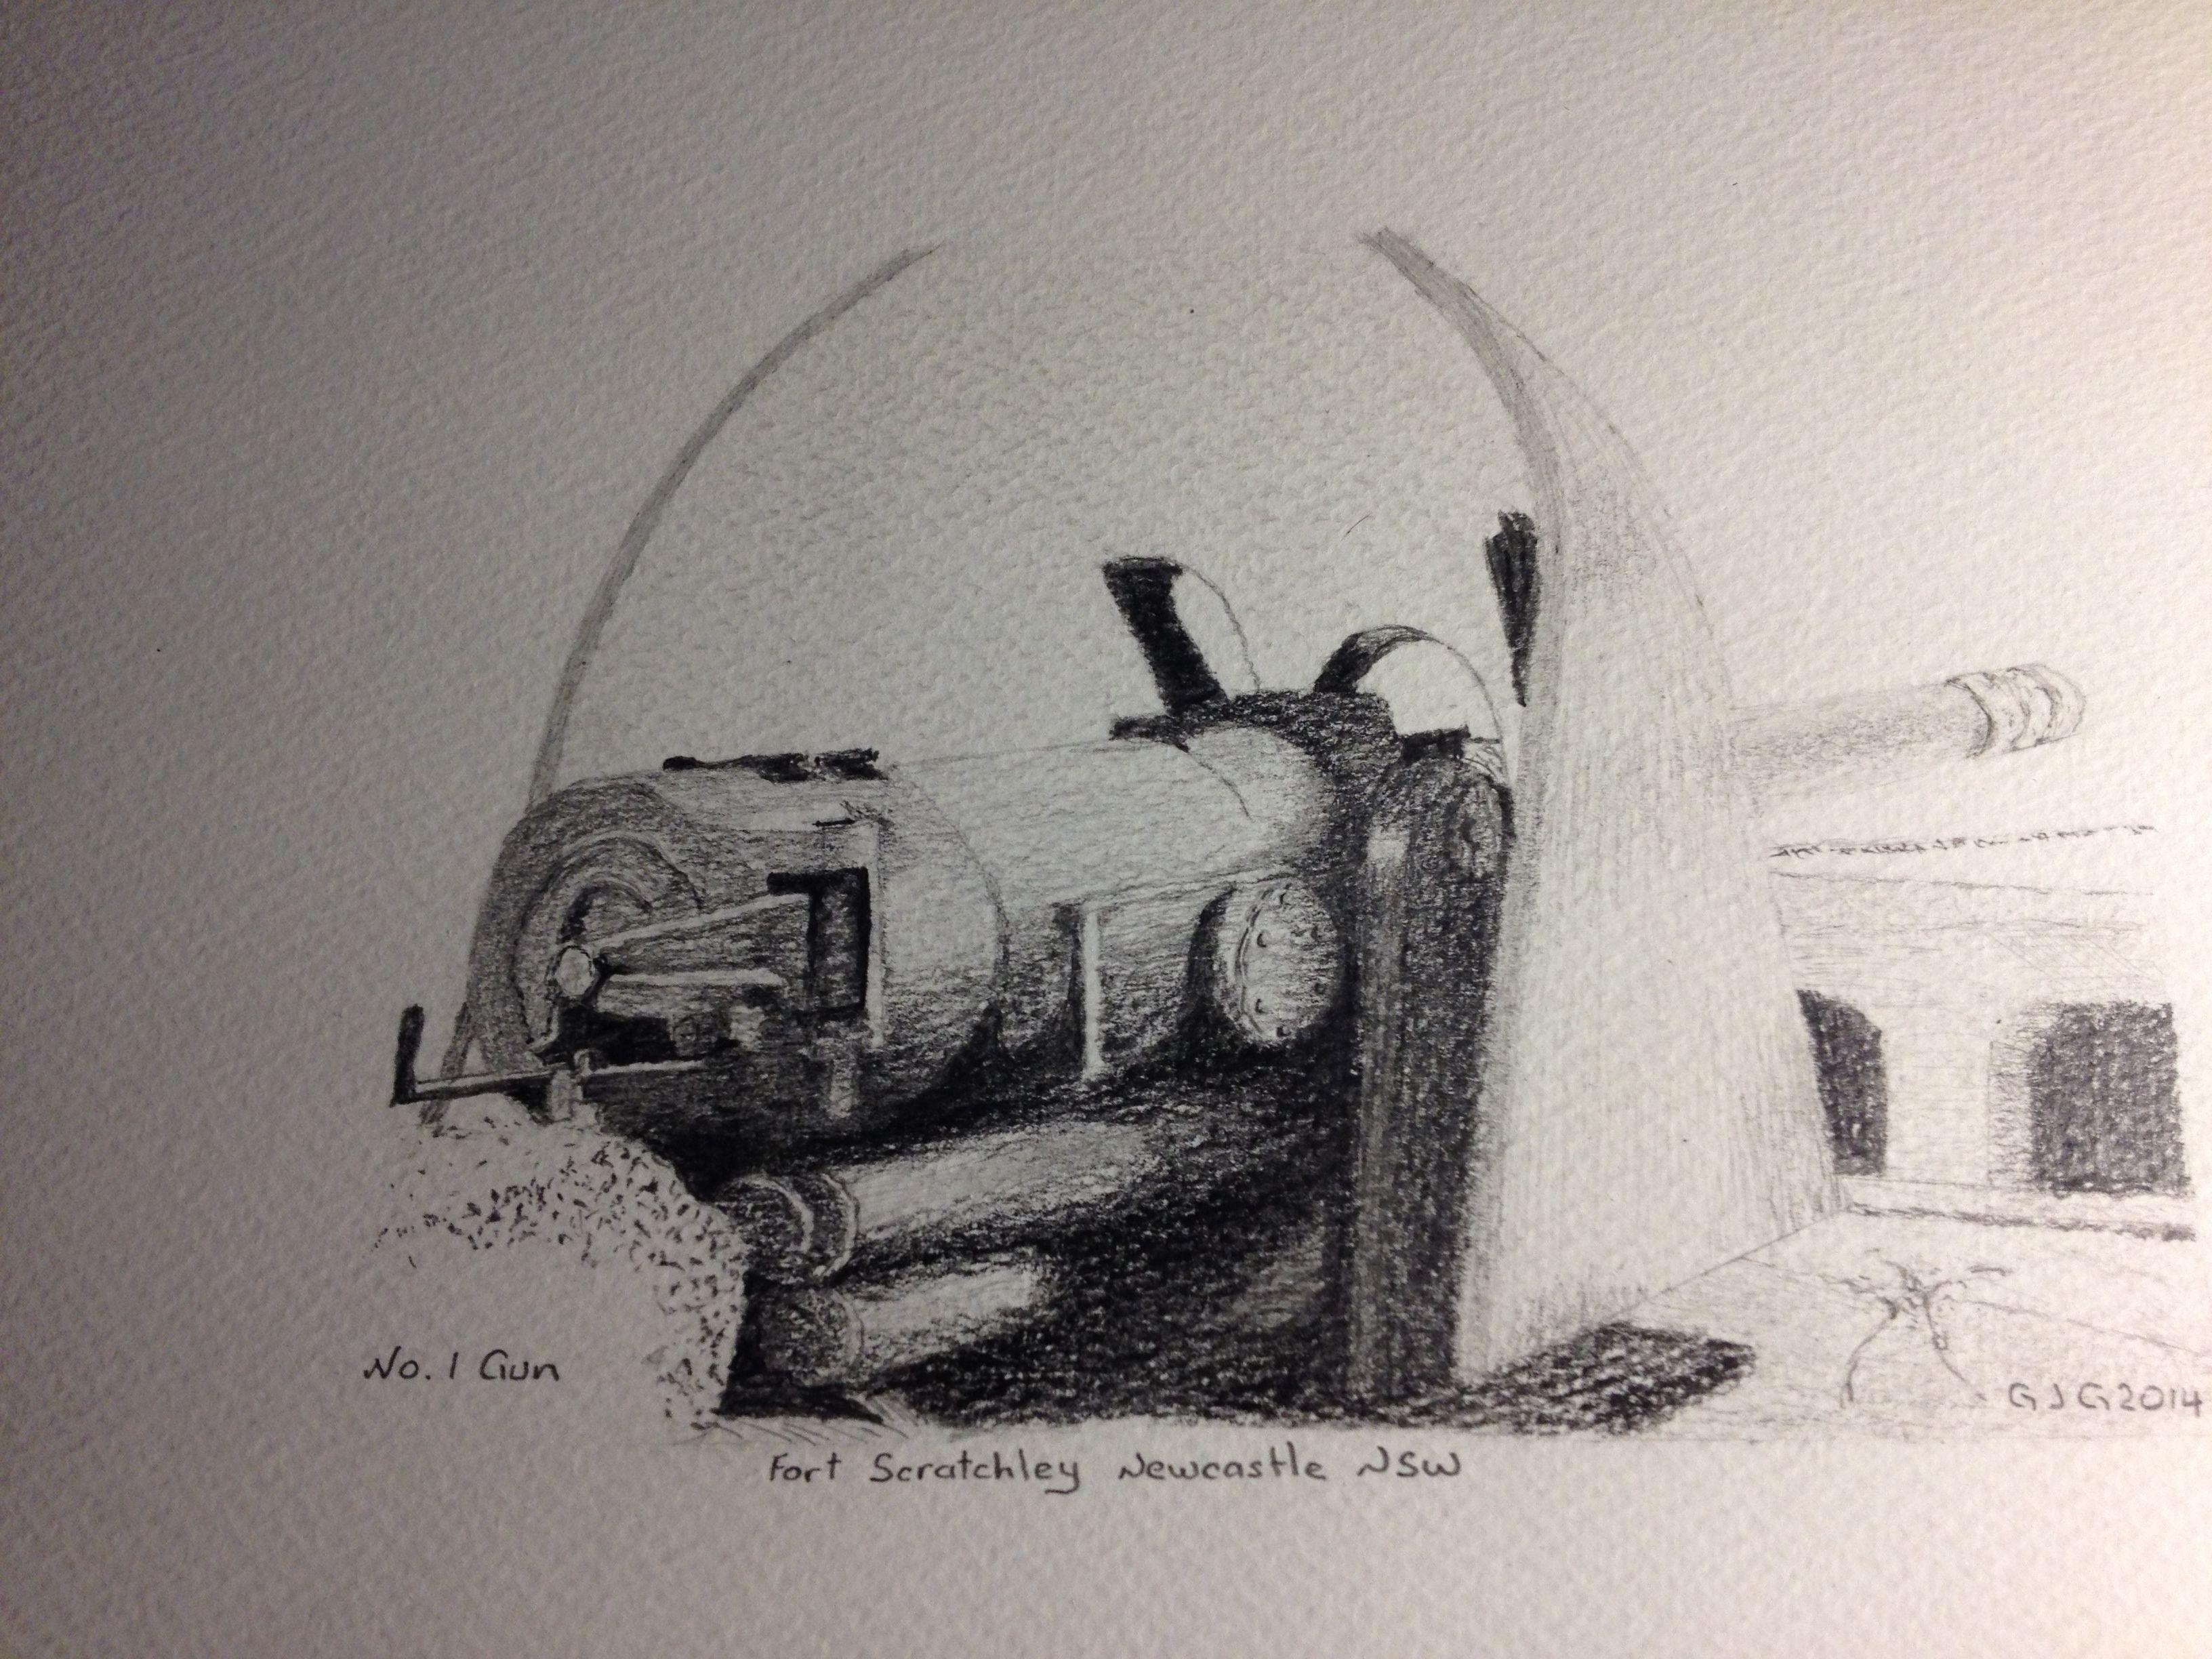 Pencil drawings graphite